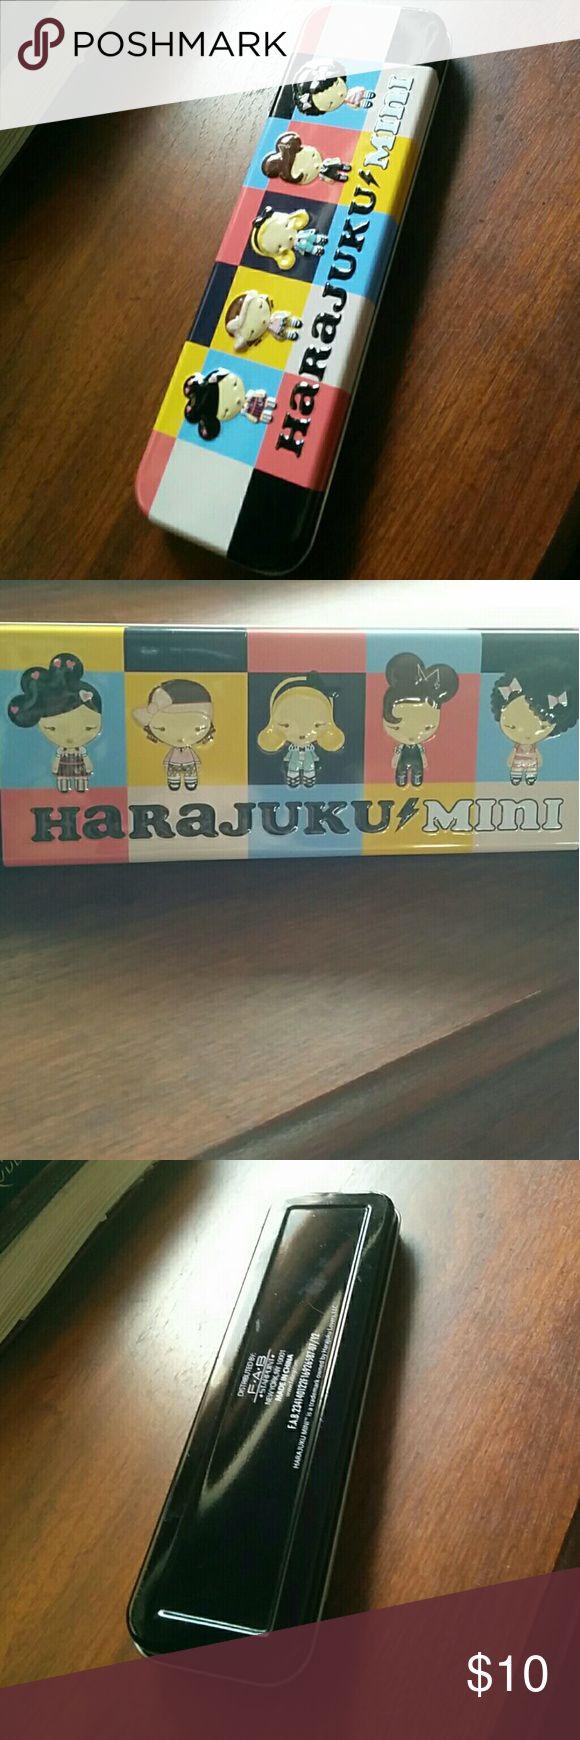 Harajuku ⚡Mini case. Rare and adorable pencil/make-up brush case and multi col…